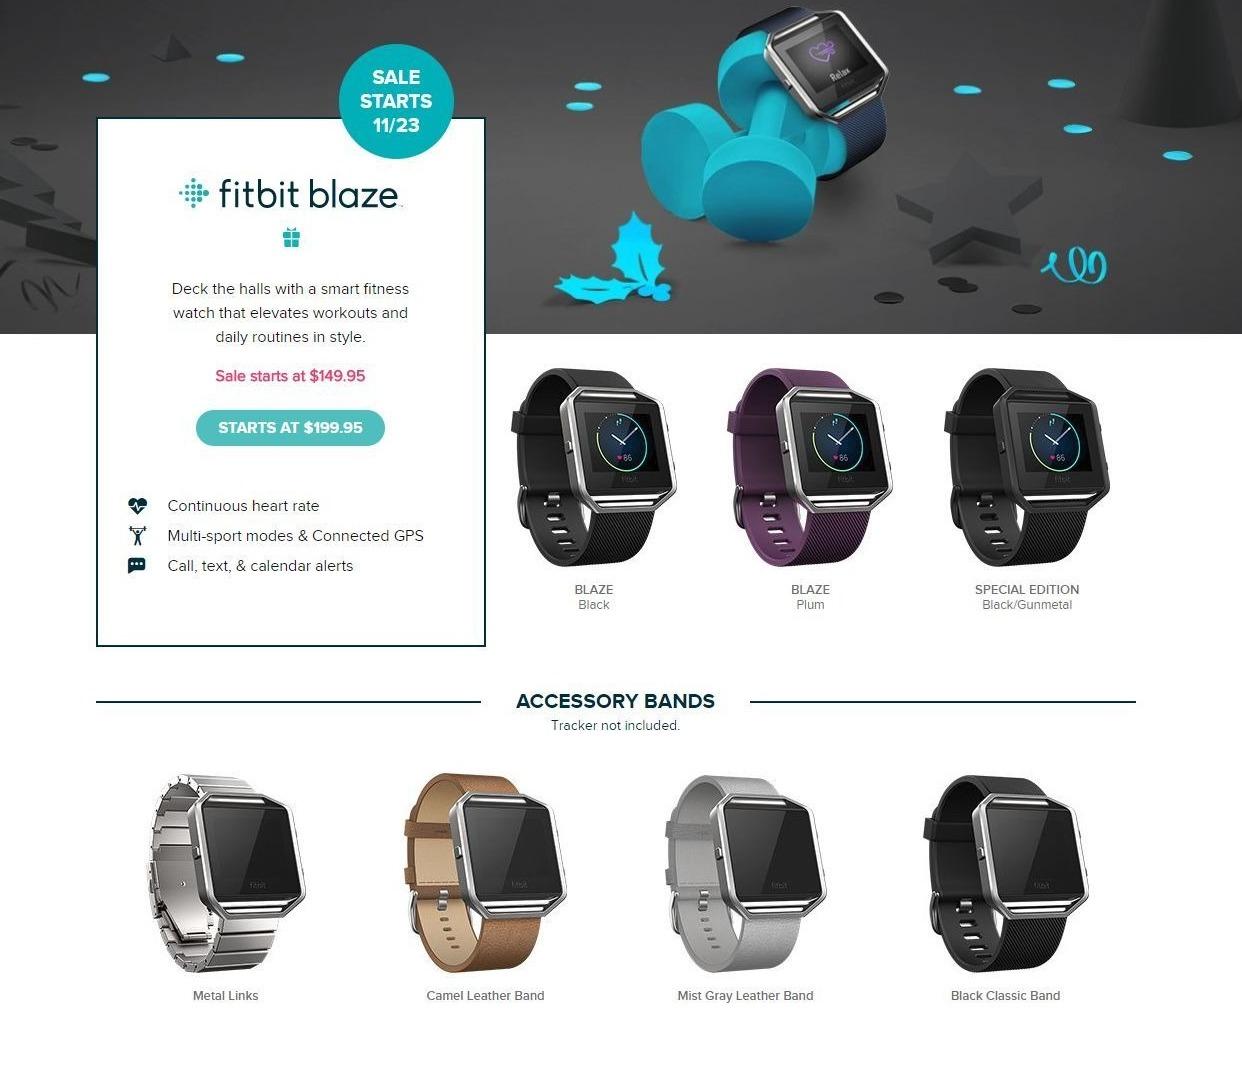 Fitbit Black Friday: Fitbit Blaze - $149.95 & UP